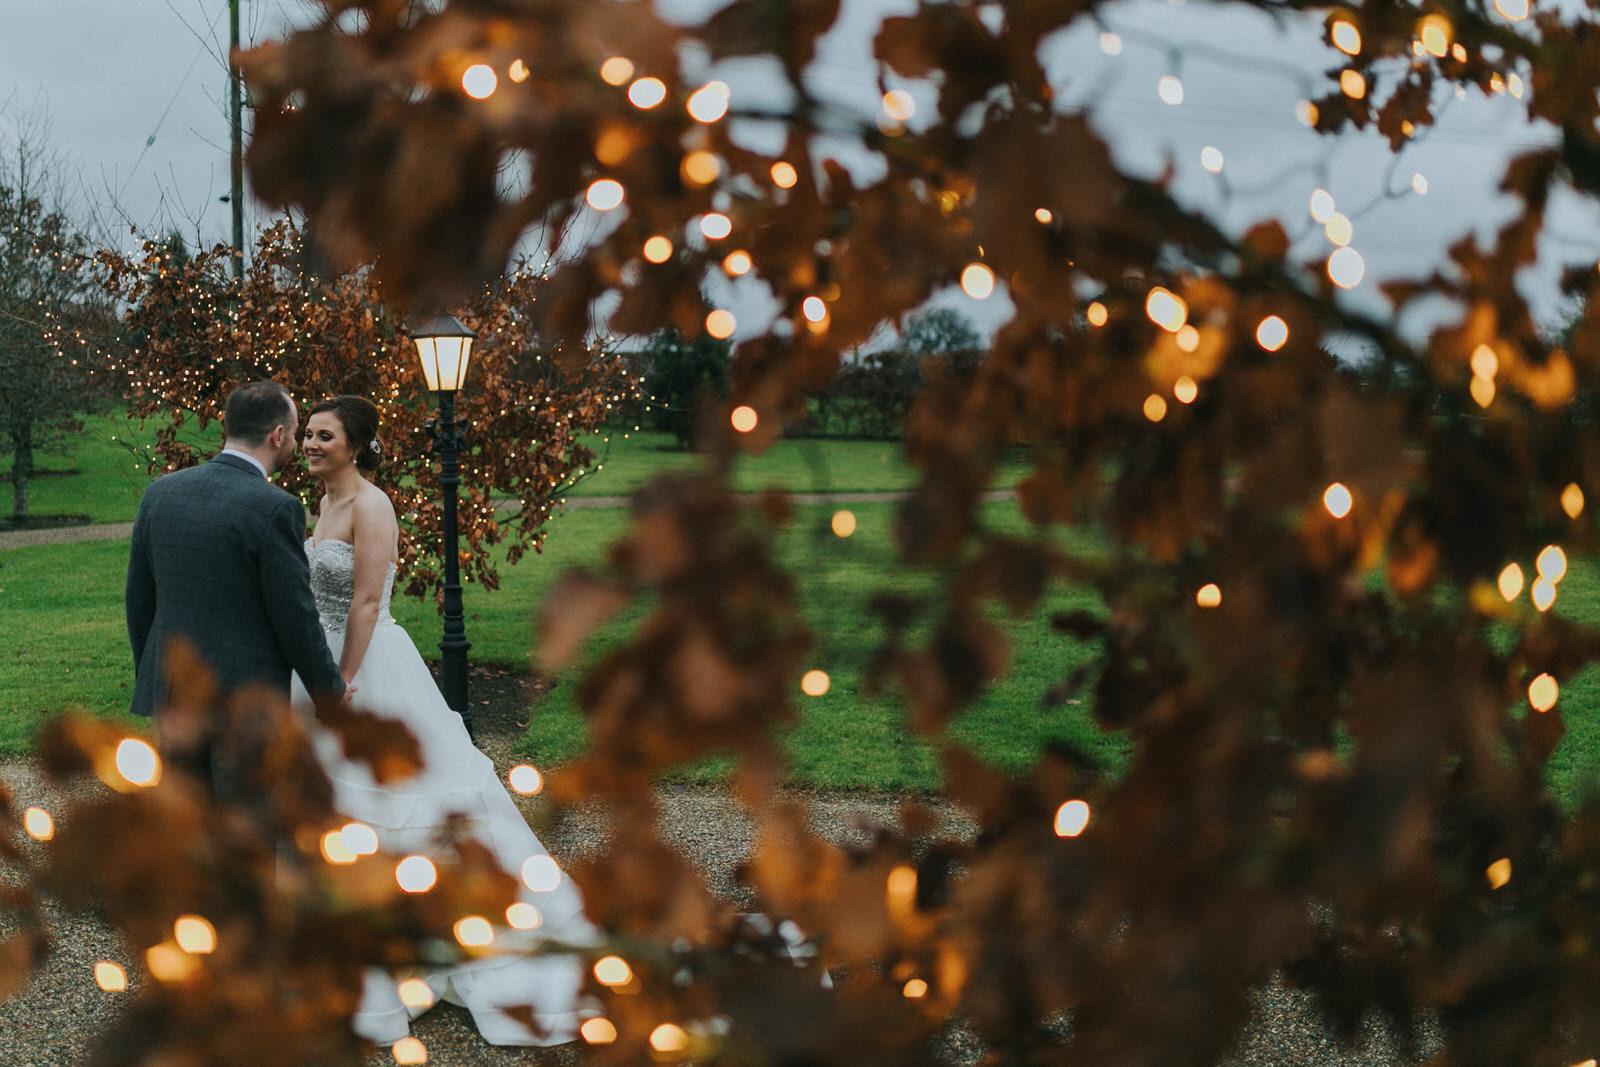 Clonabreany_wedding-photographer_roger_kenny_ireland_083.jpg